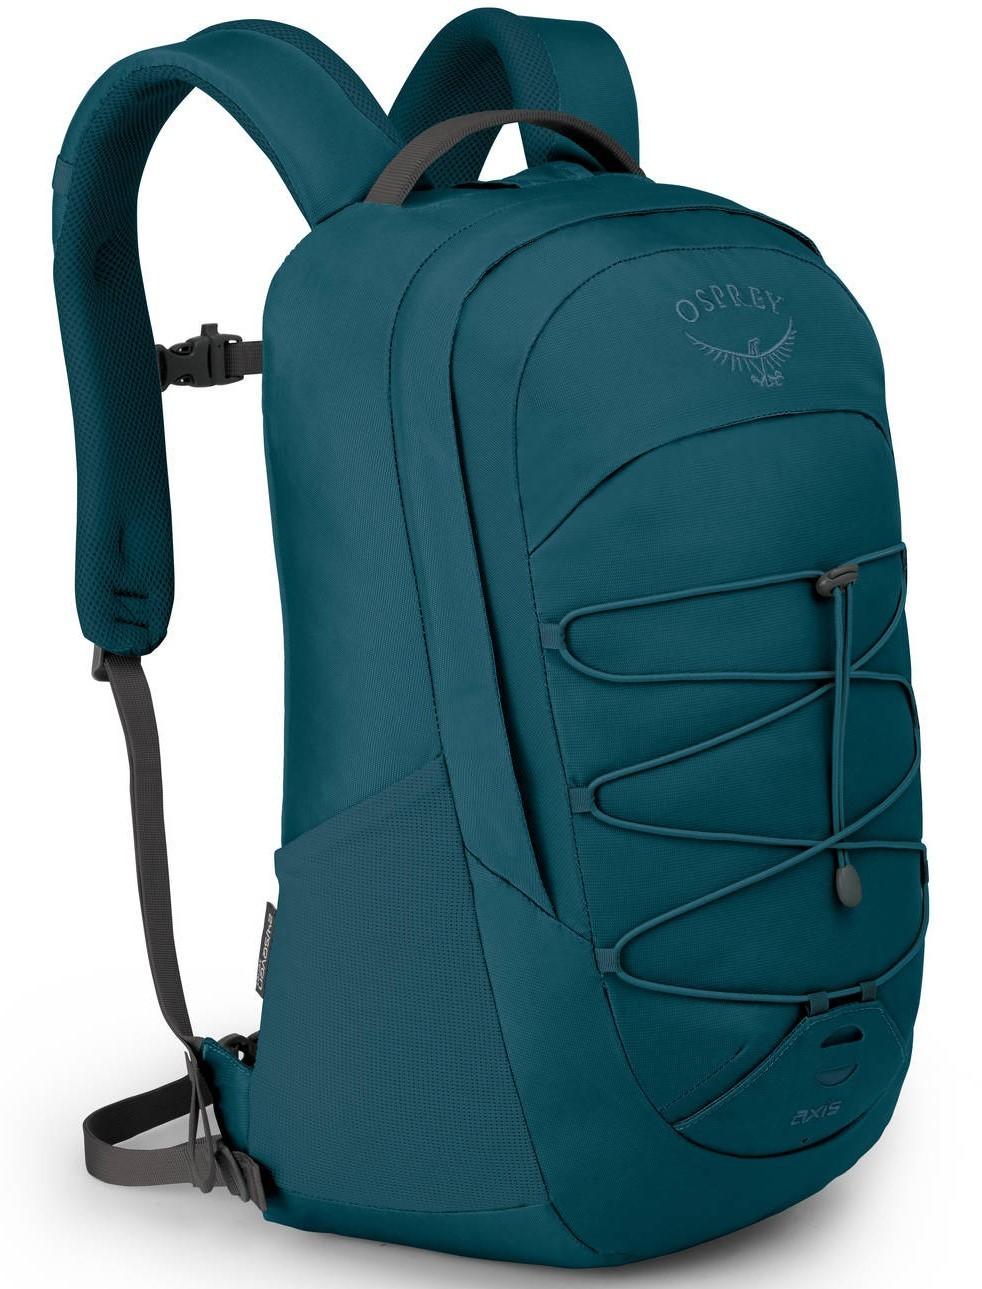 Городские рюкзаки Рюкзак Osprey Axis 18 Ethel Blue Axis_F19_Side_Ethel_Blue_web.jpg